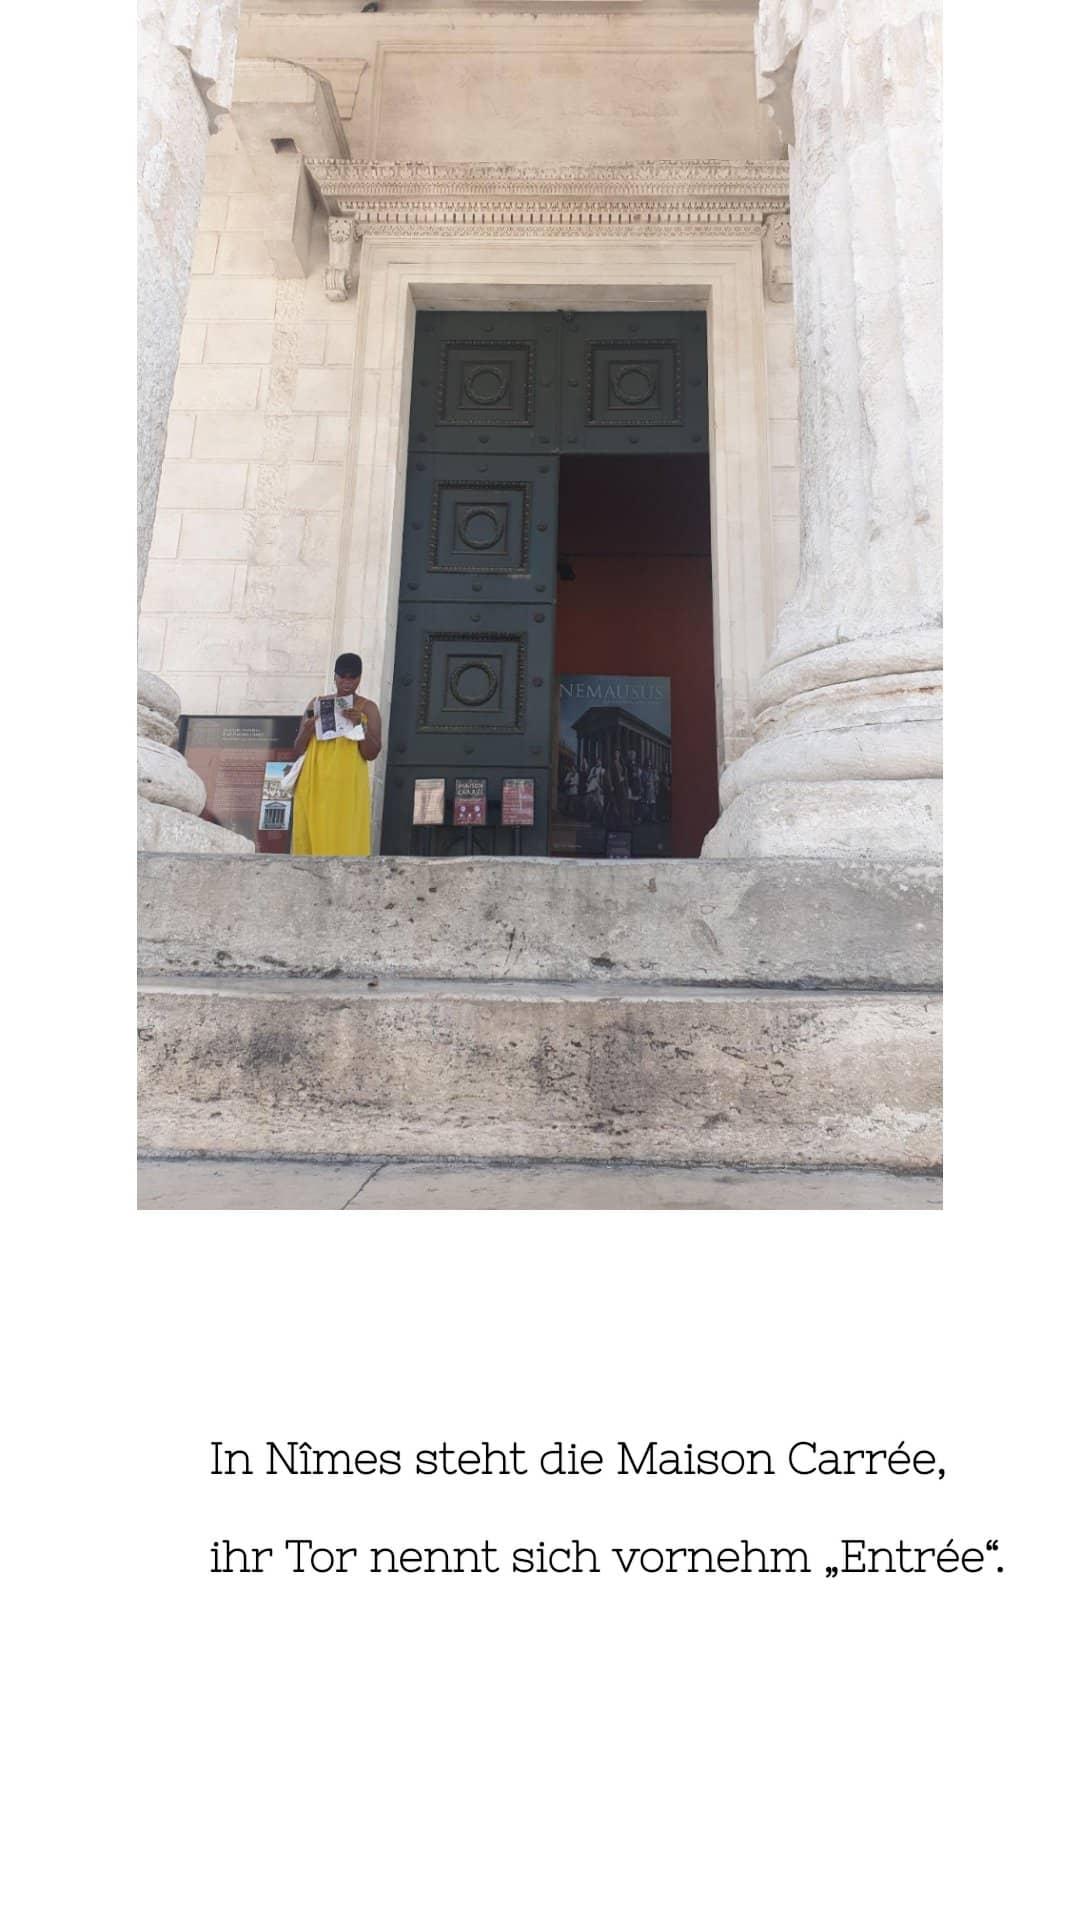 Maison Carrée in Nîmes